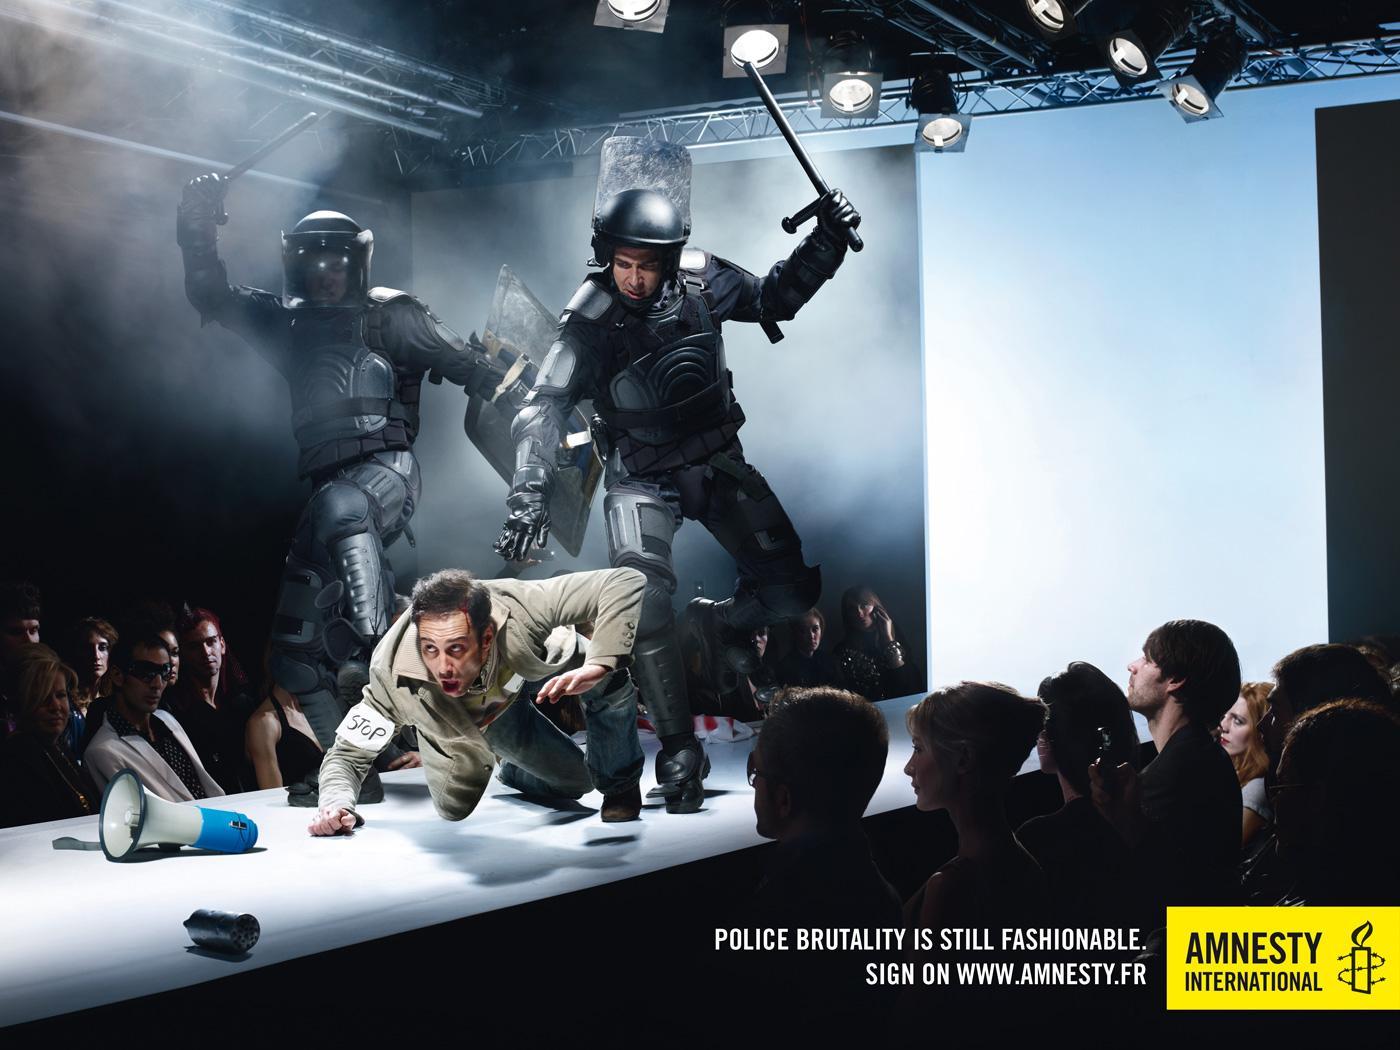 Amnesty International Print Ad -  Fashion, Police